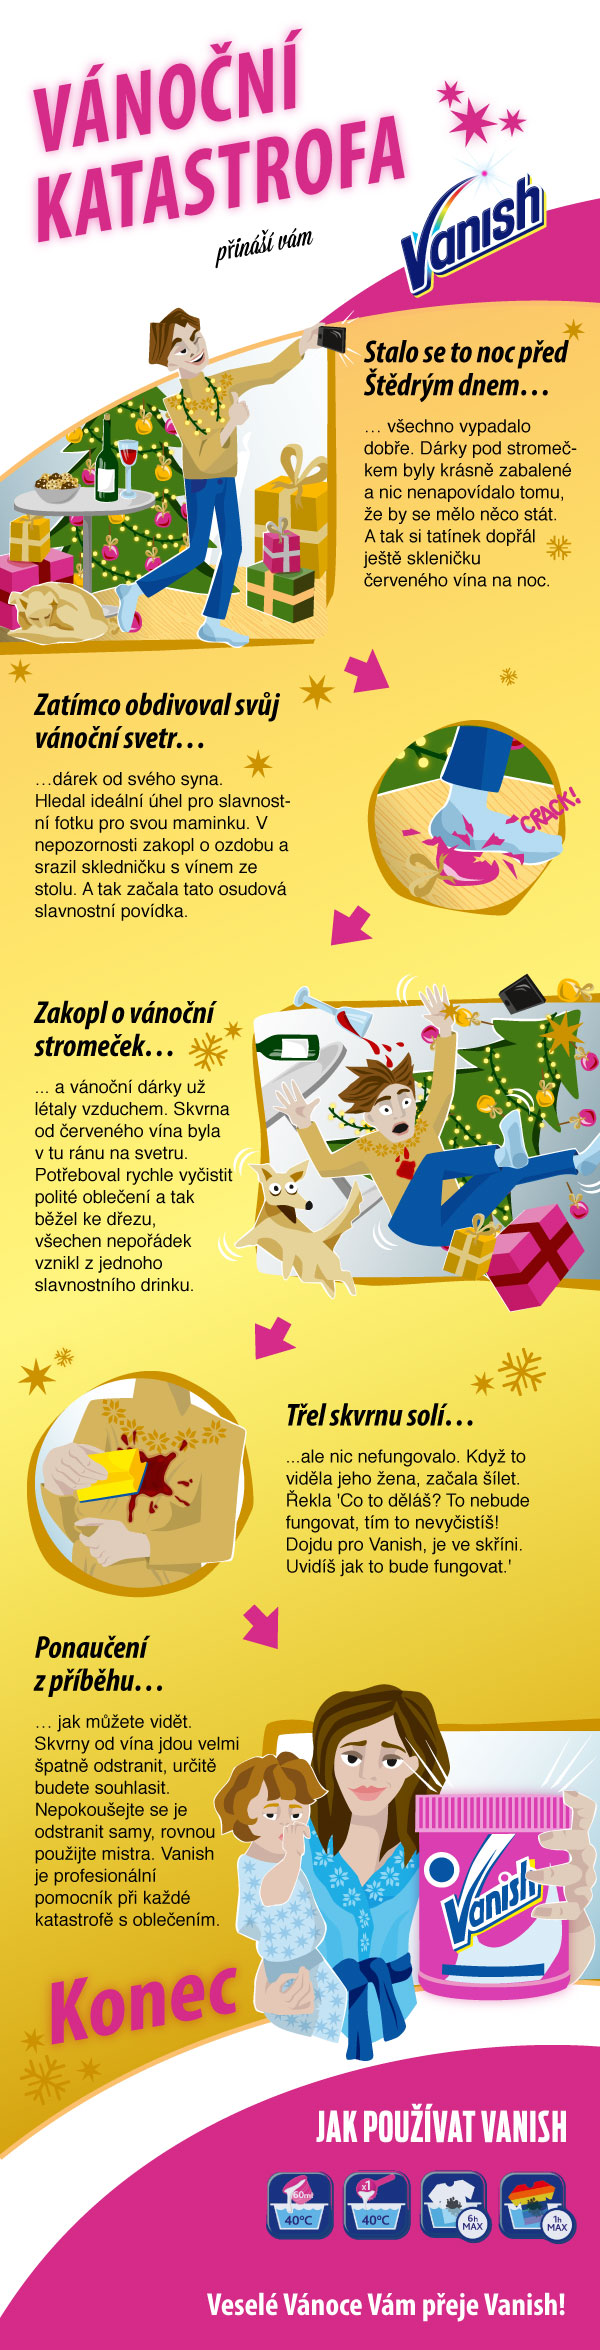 Vánoční katastrofa - infografika